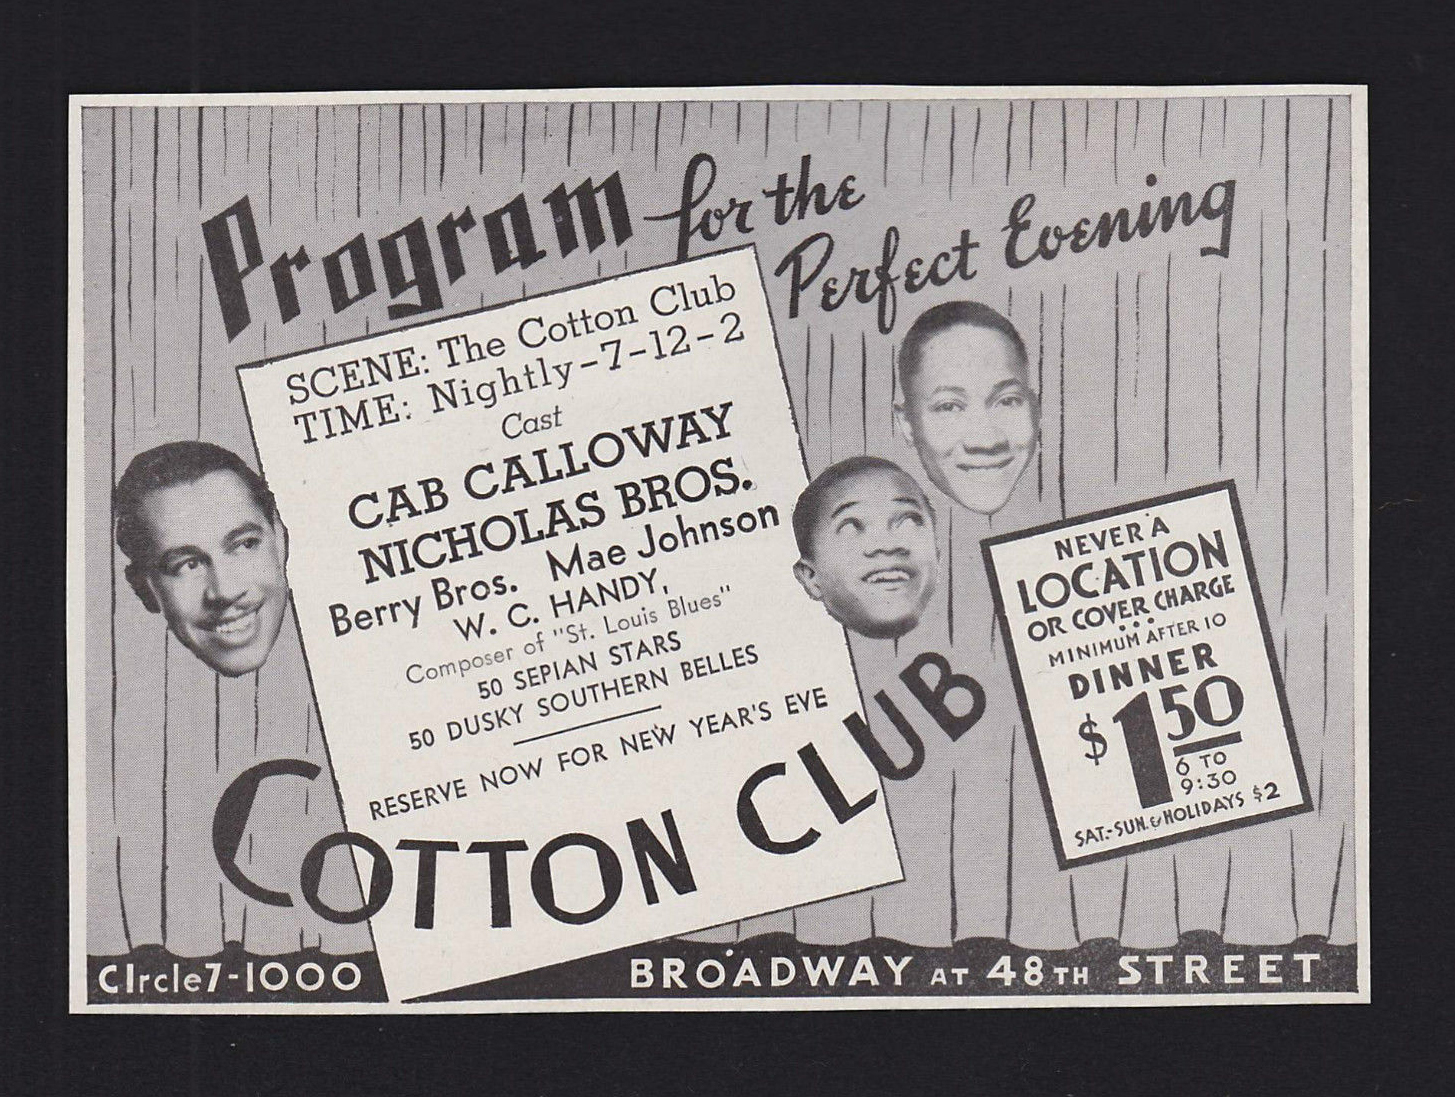 The Cotton Club в Токио